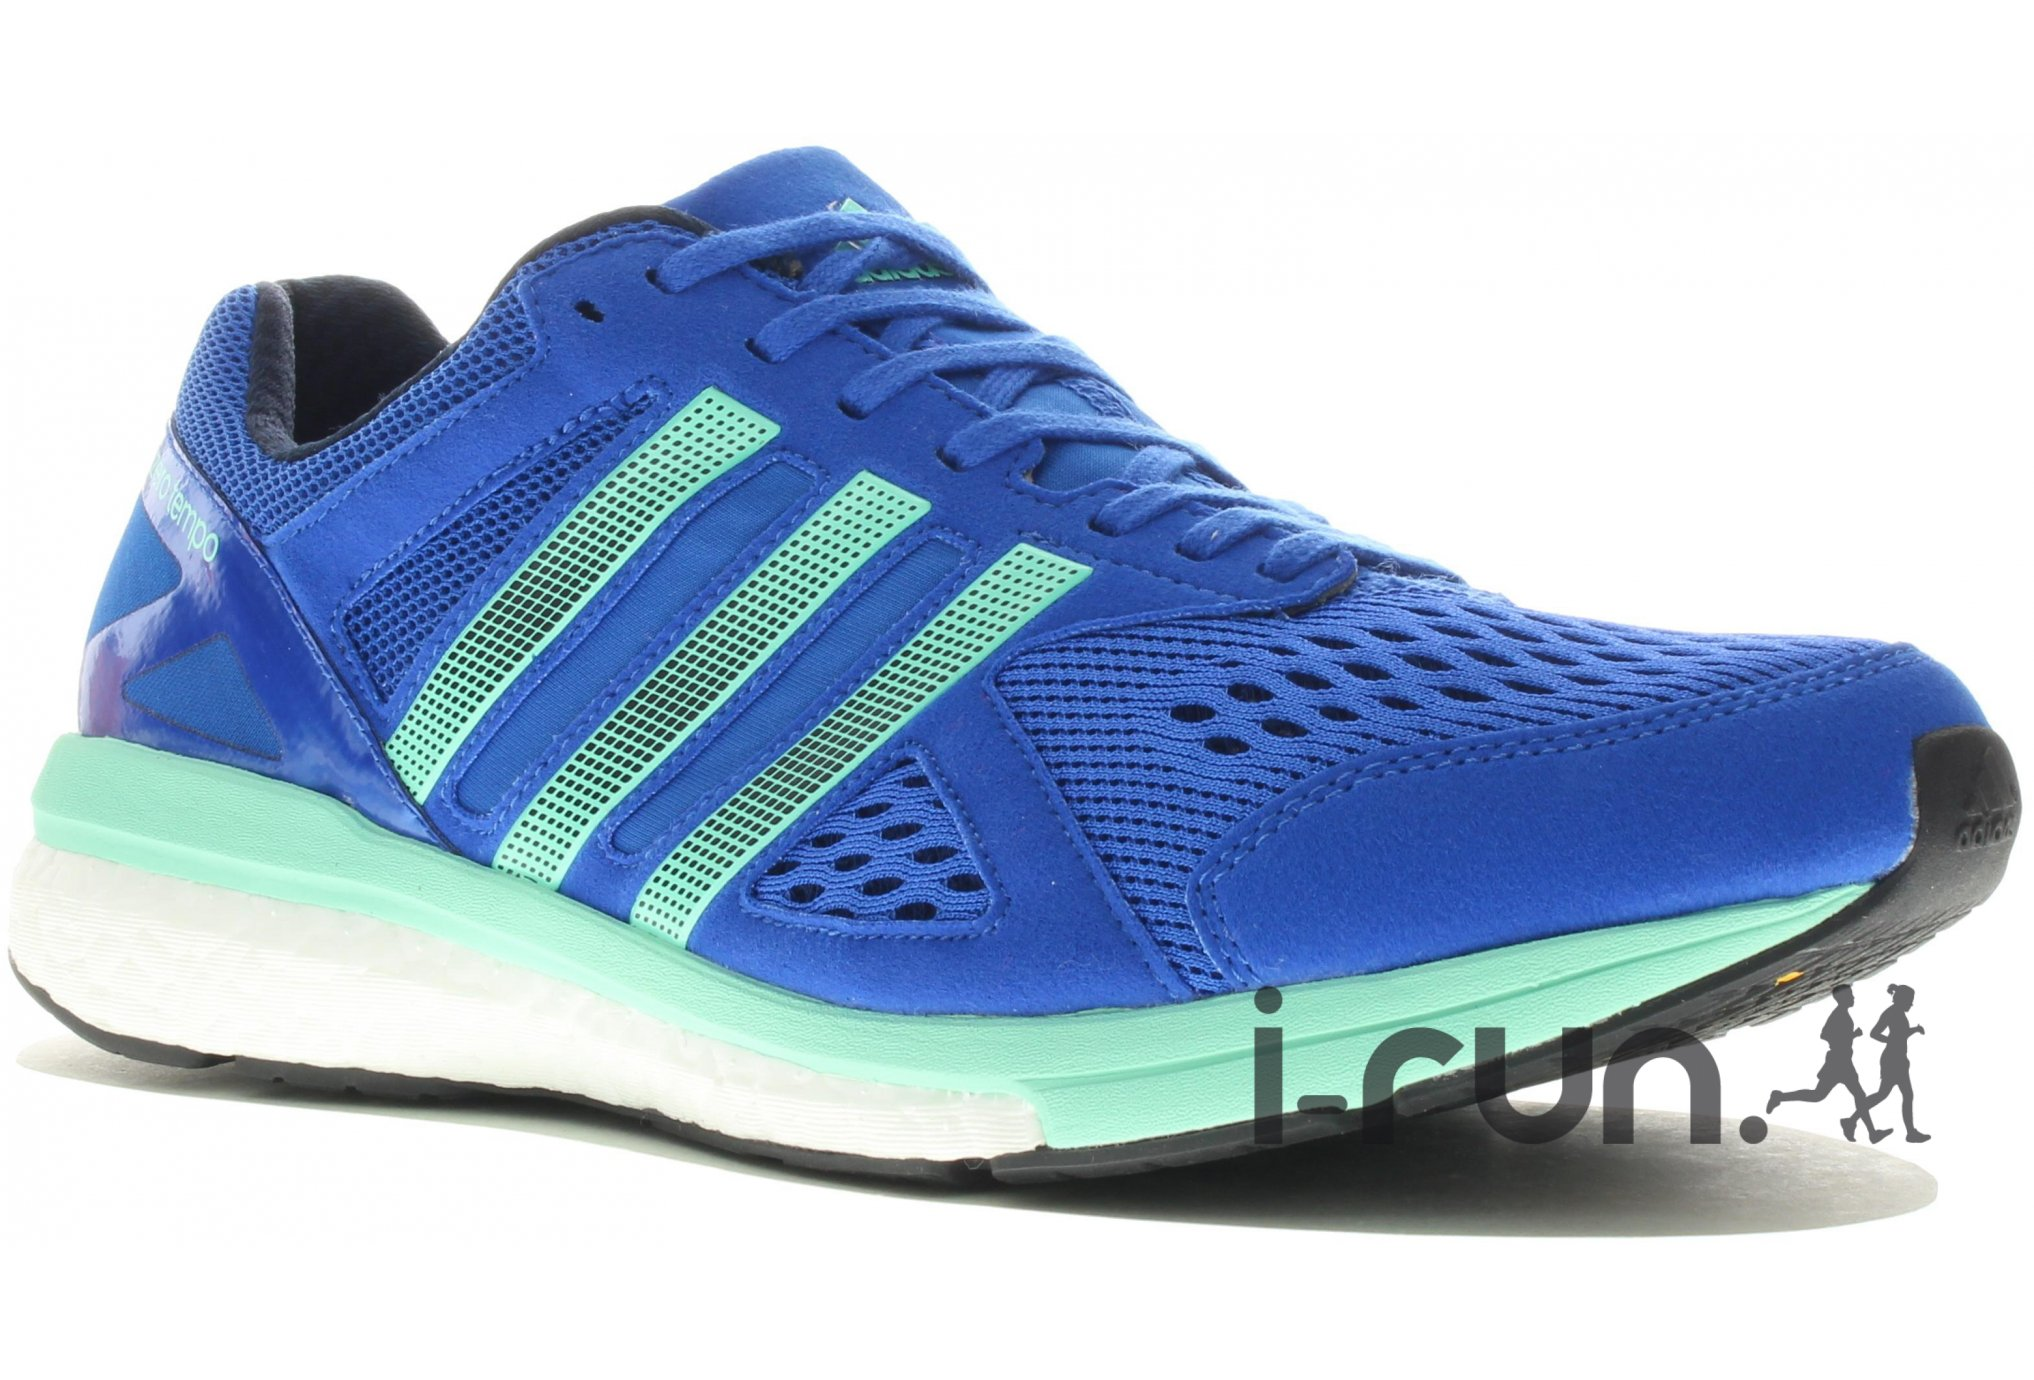 Adidas Adizero tempo 8 m chaussures homme